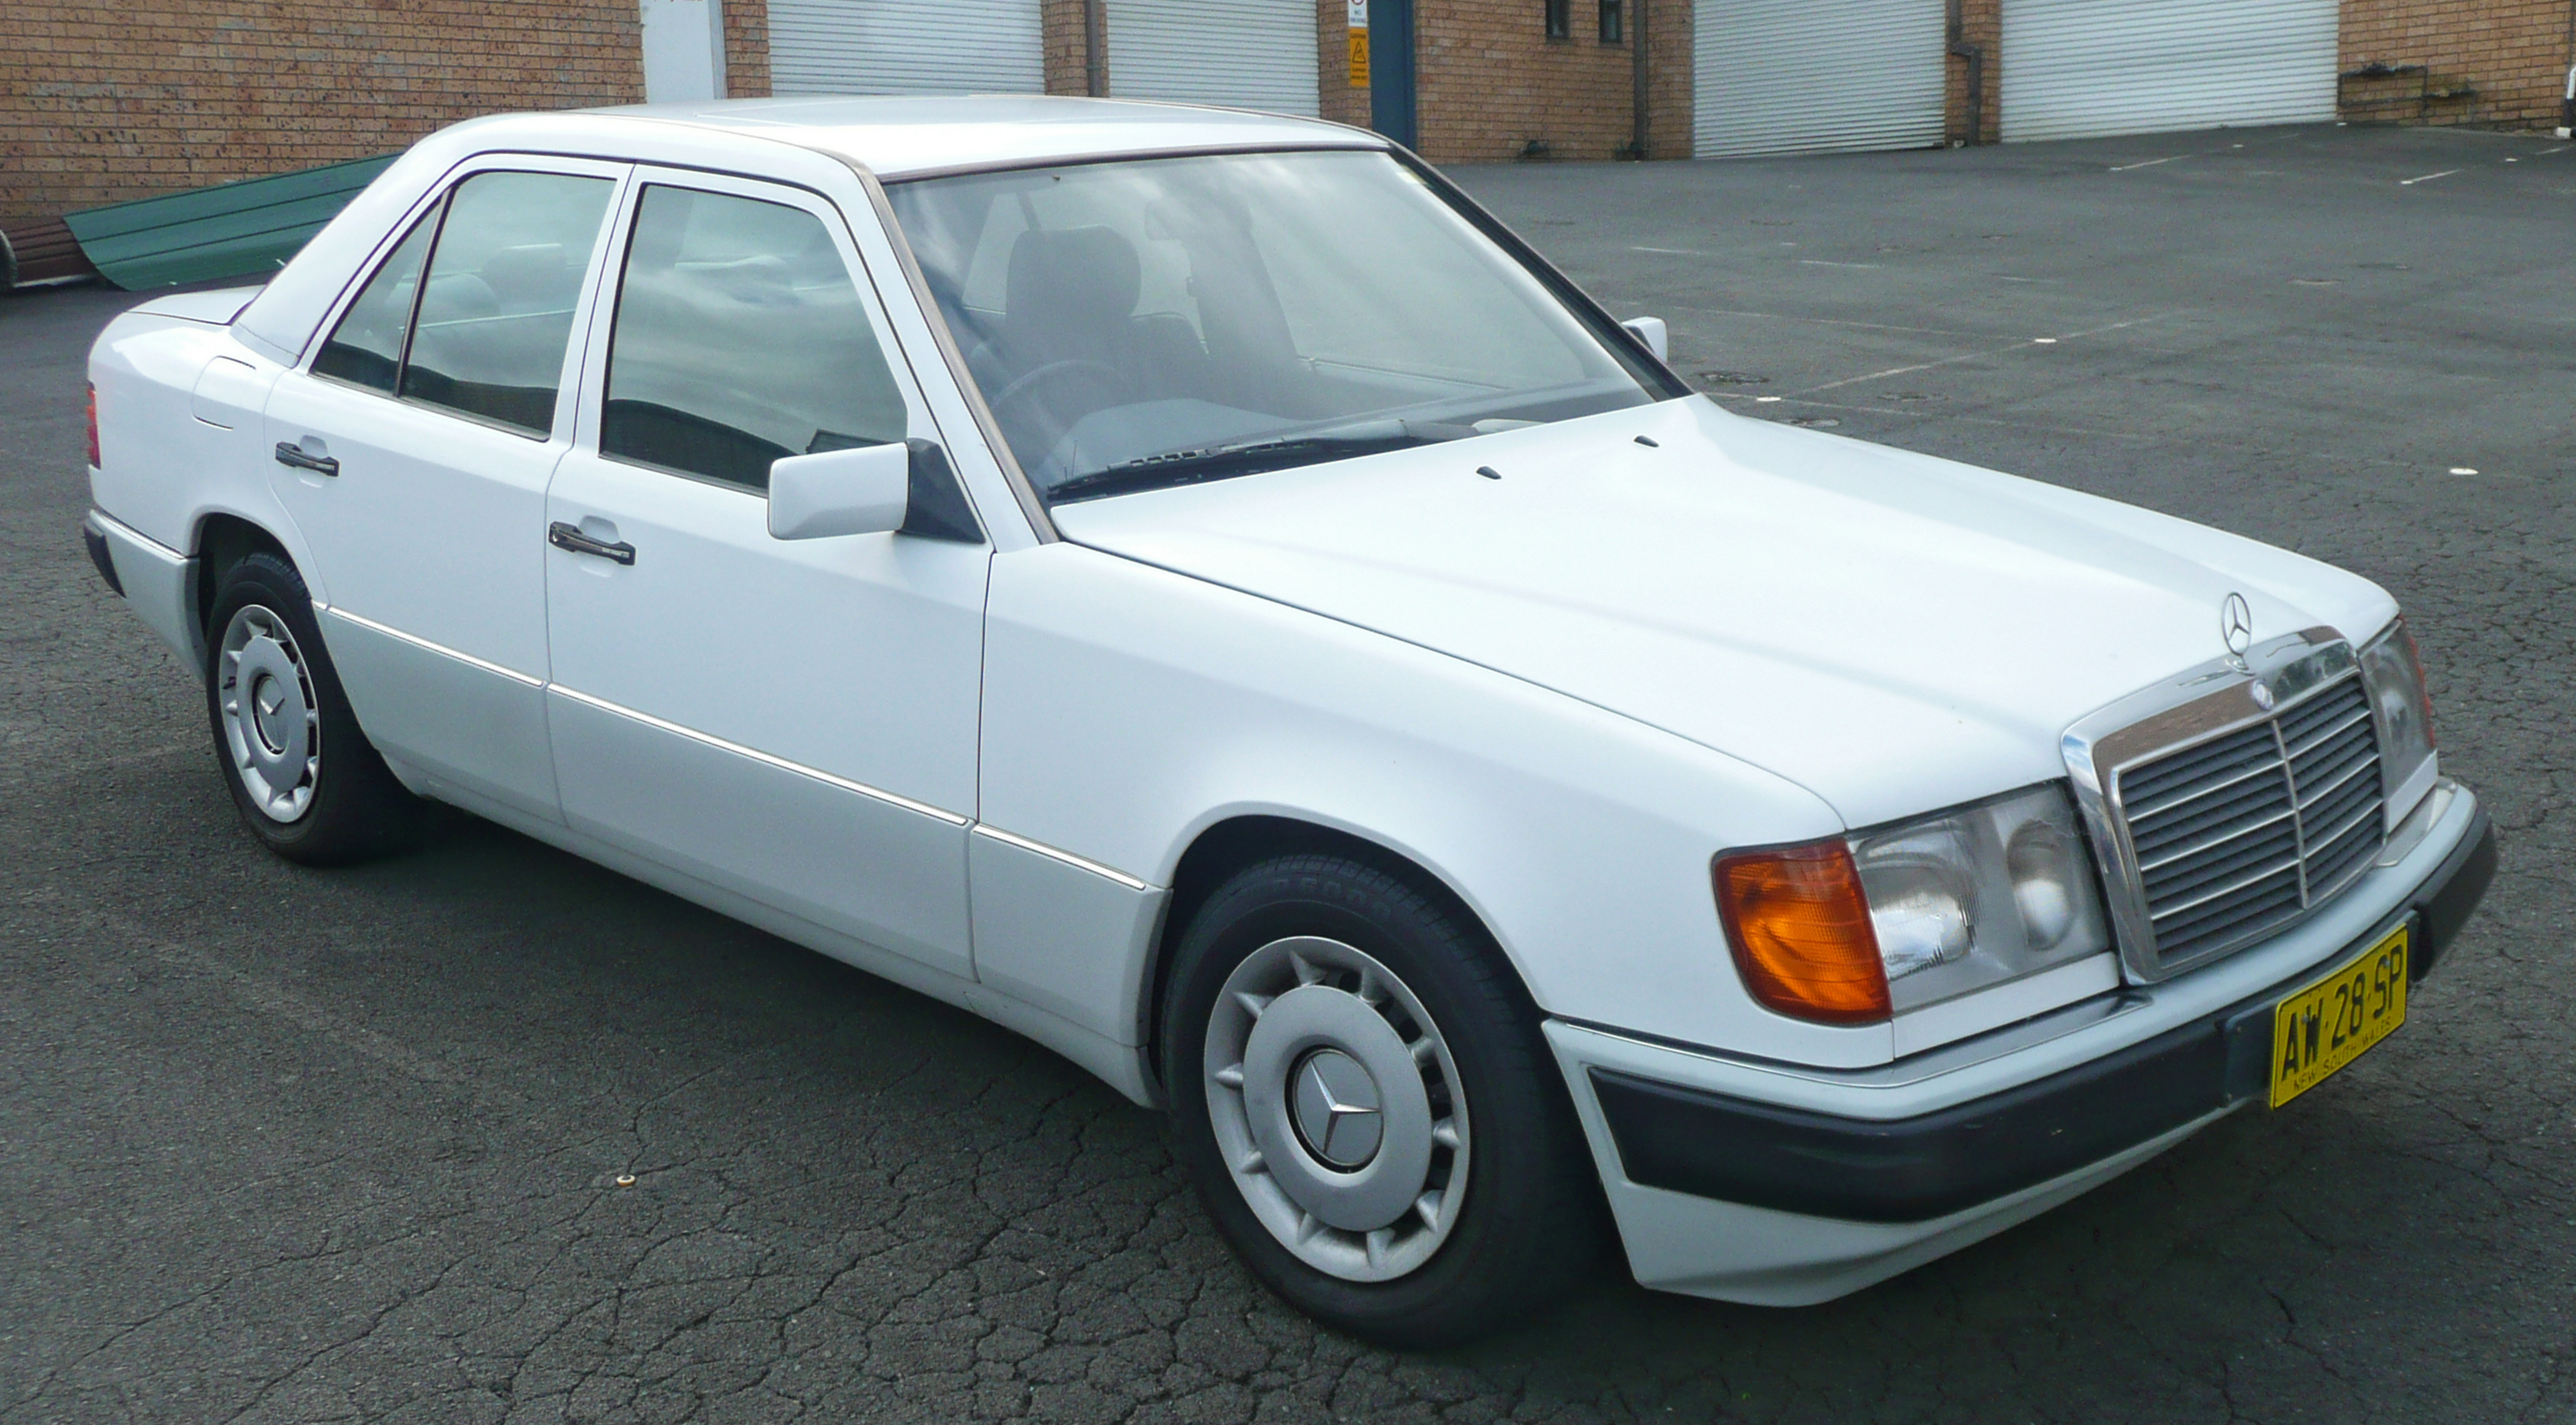 Dosya 1990 1993 mercedes benz 230 e w124 sedan for How much is a 1990 mercedes benz worth